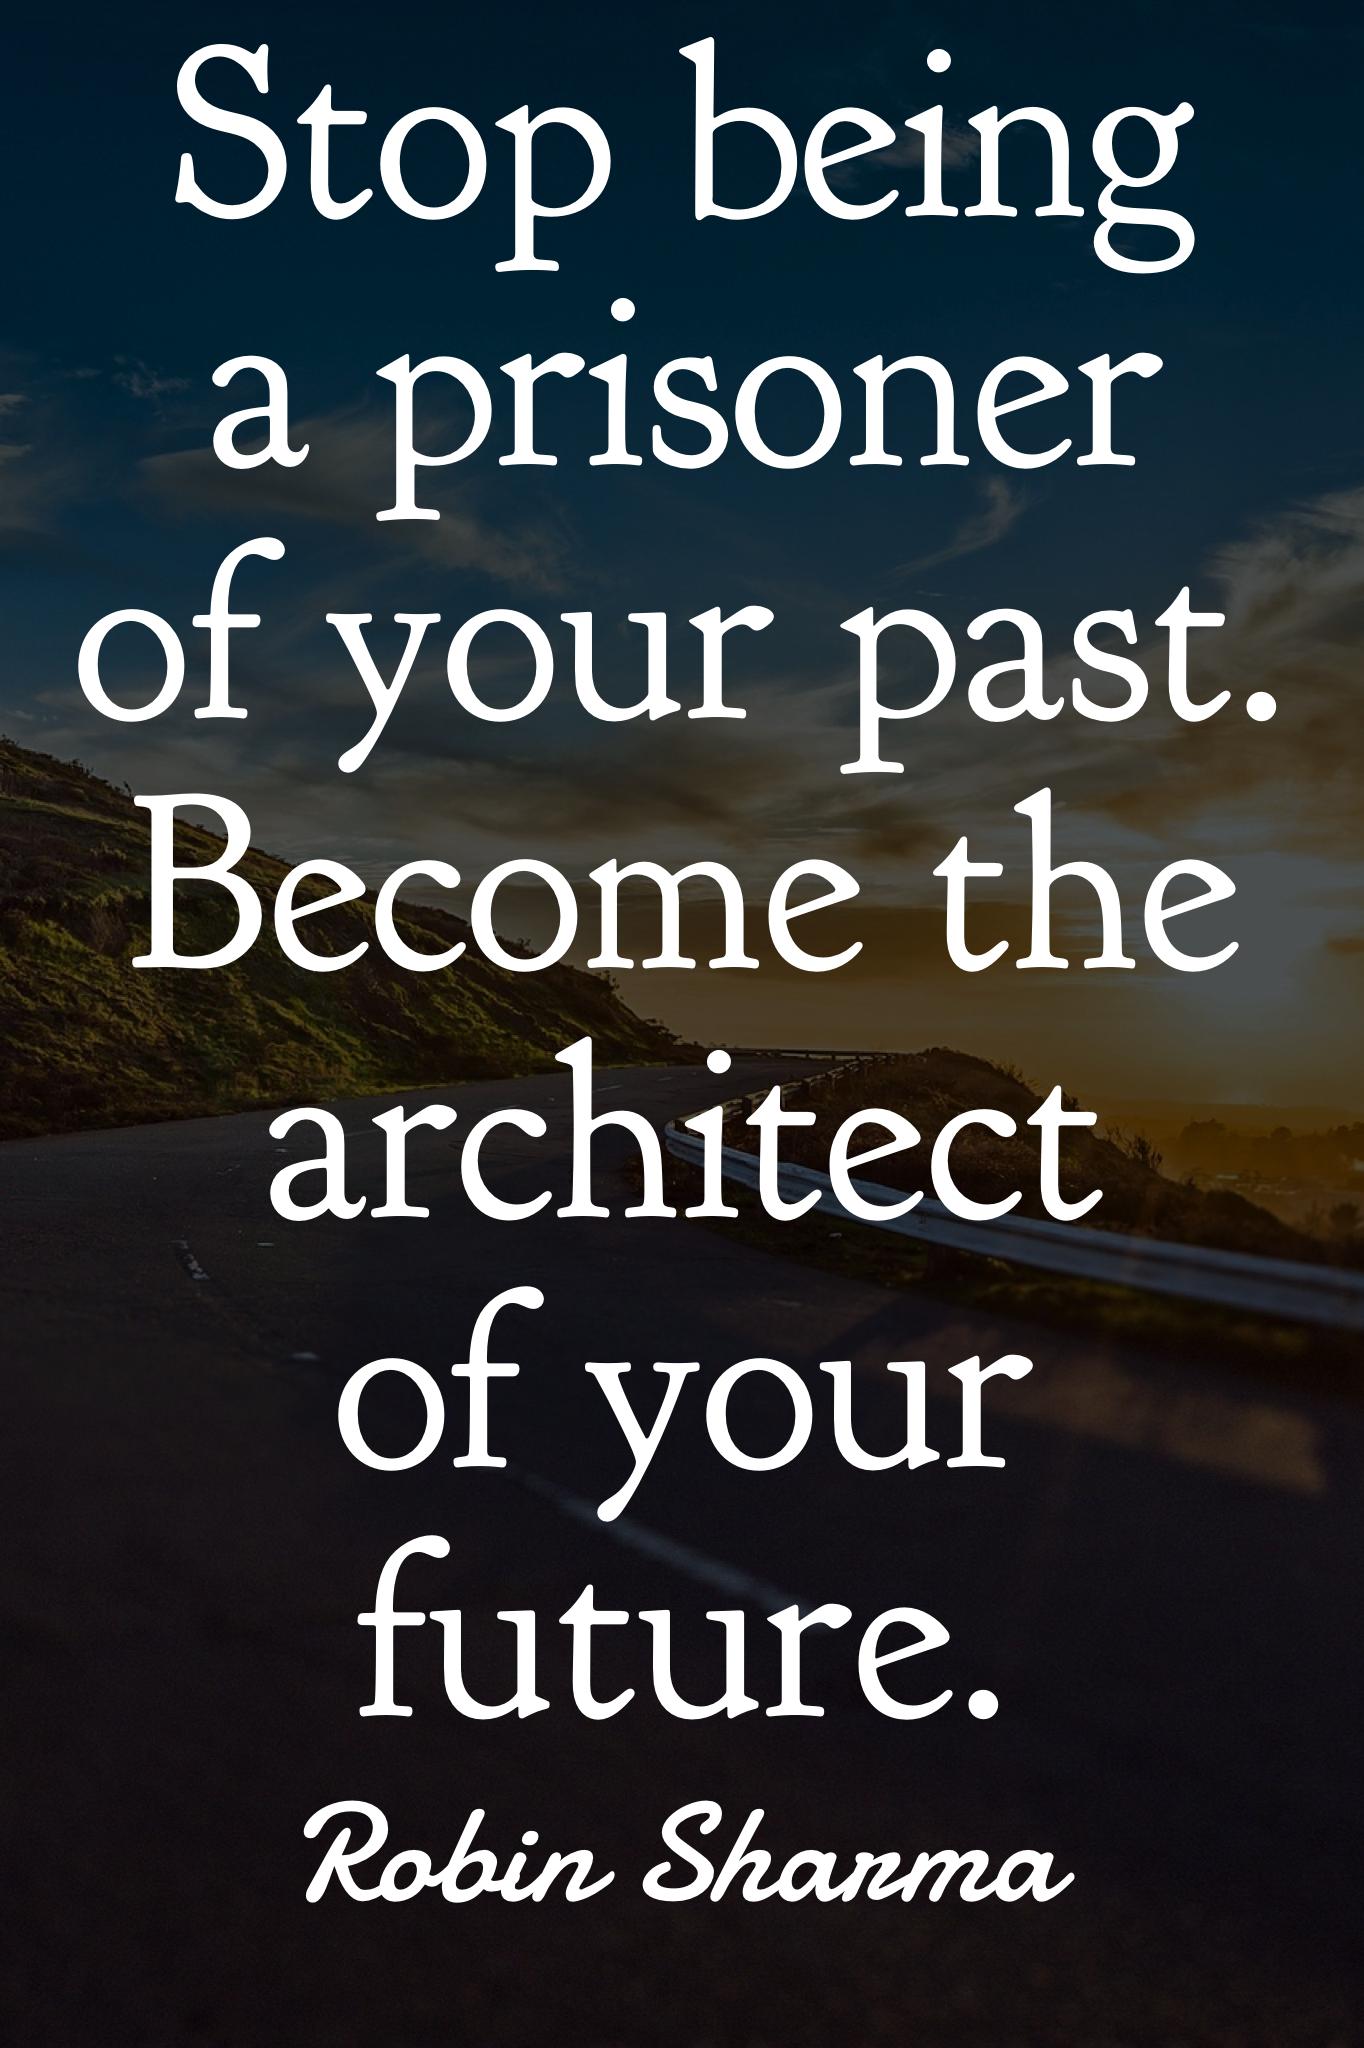 40 Inspirational Robin Sharma Quotes Motivational Memes Life Quotes Robin Sharma Quotes